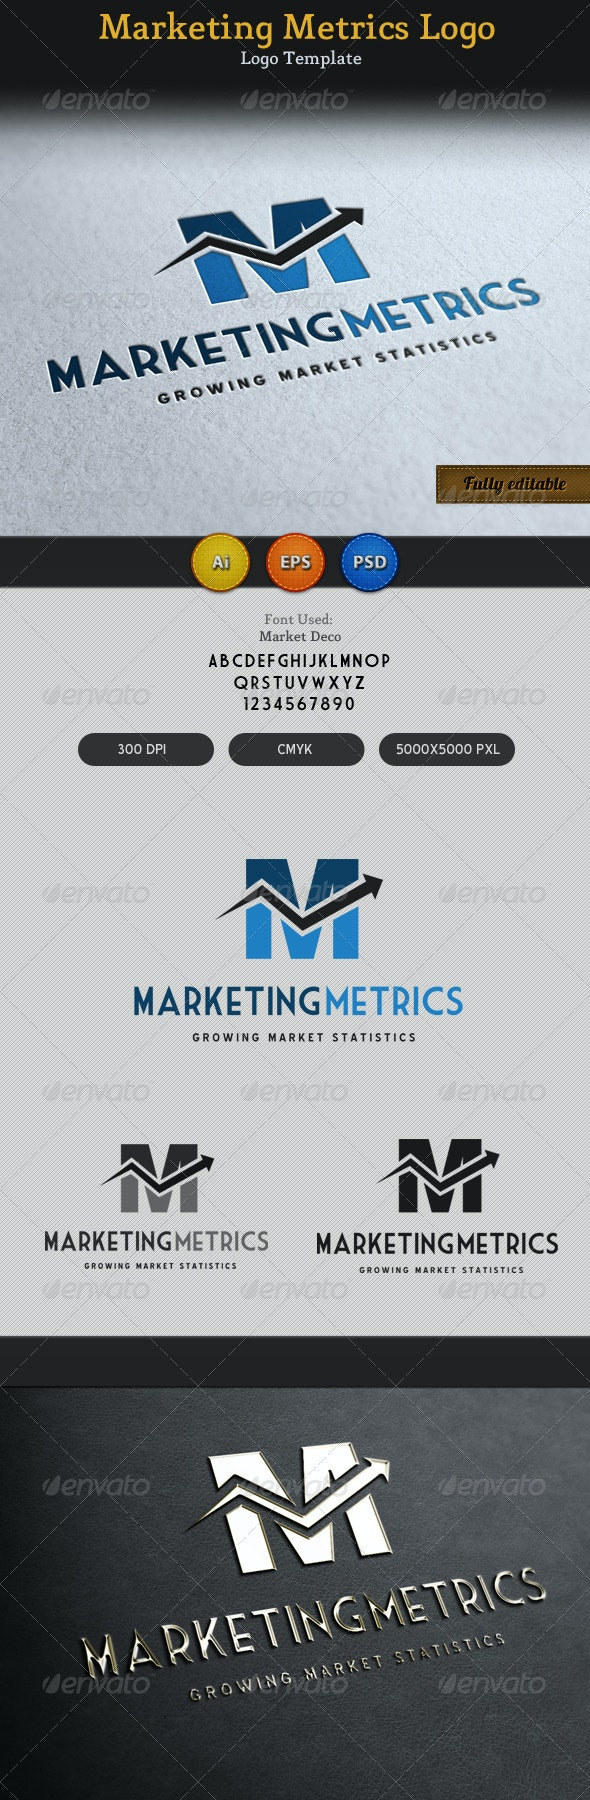 Marketing Metrics Logo 2 - Vector Abstract